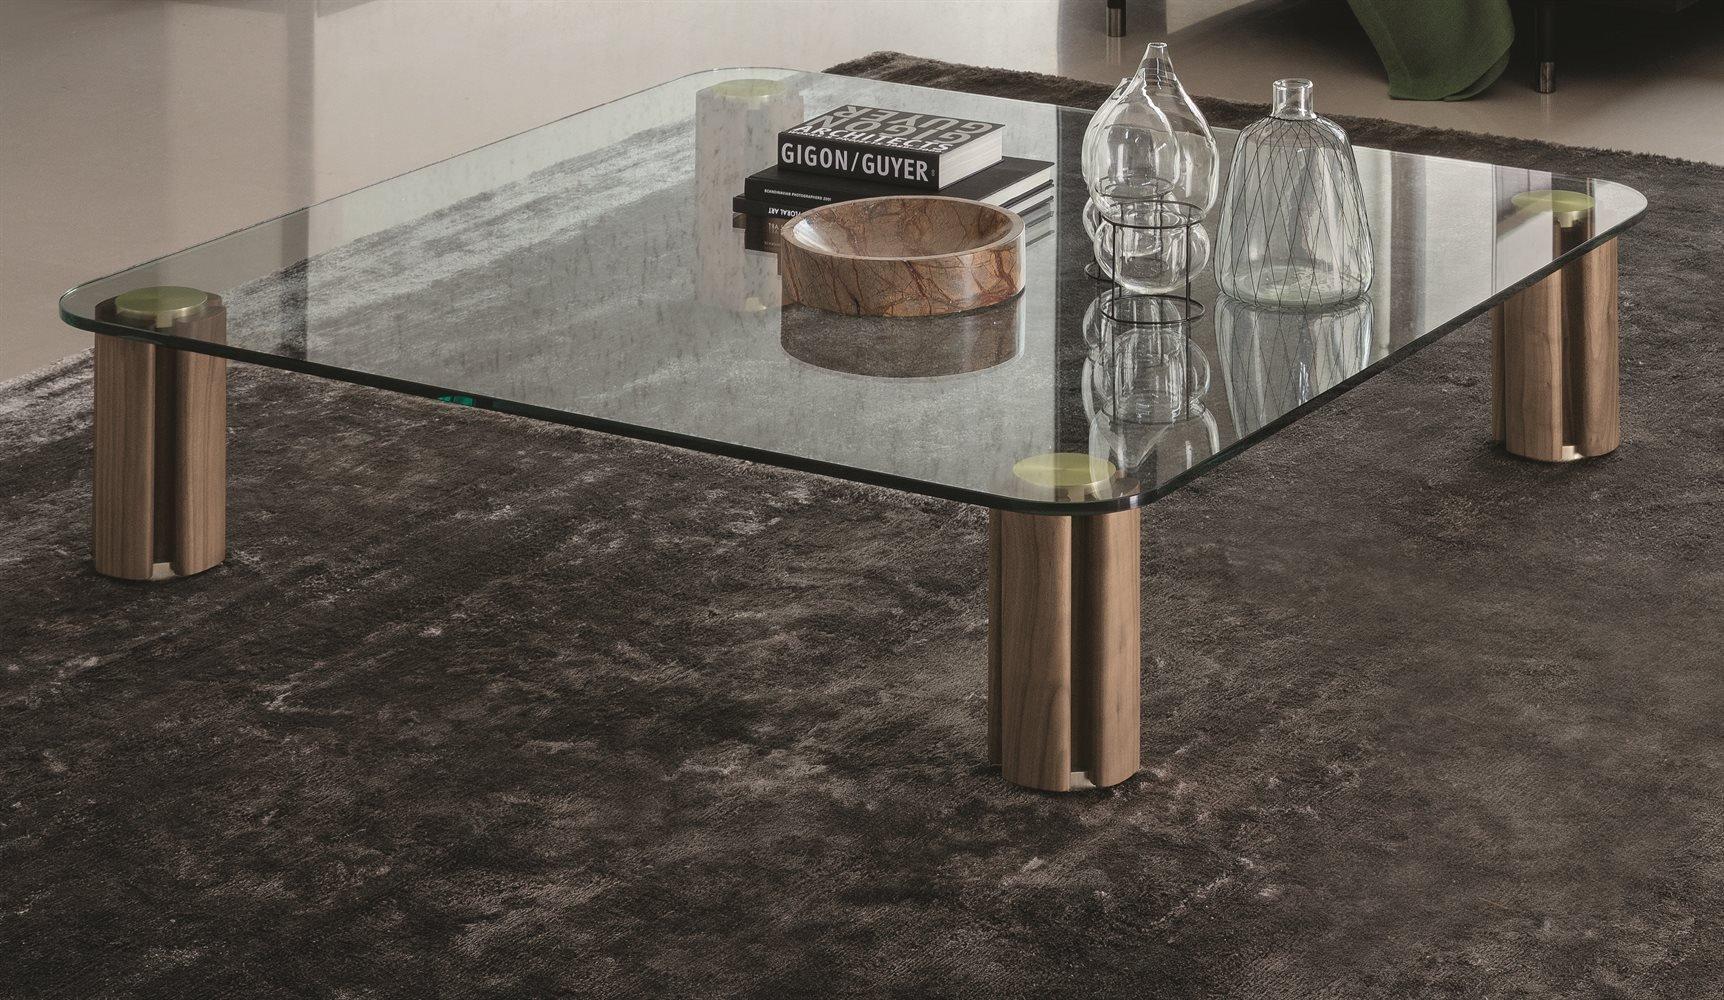 Quadrifoglio Tavolino coffee table from Porada, designed by C. Ballabio